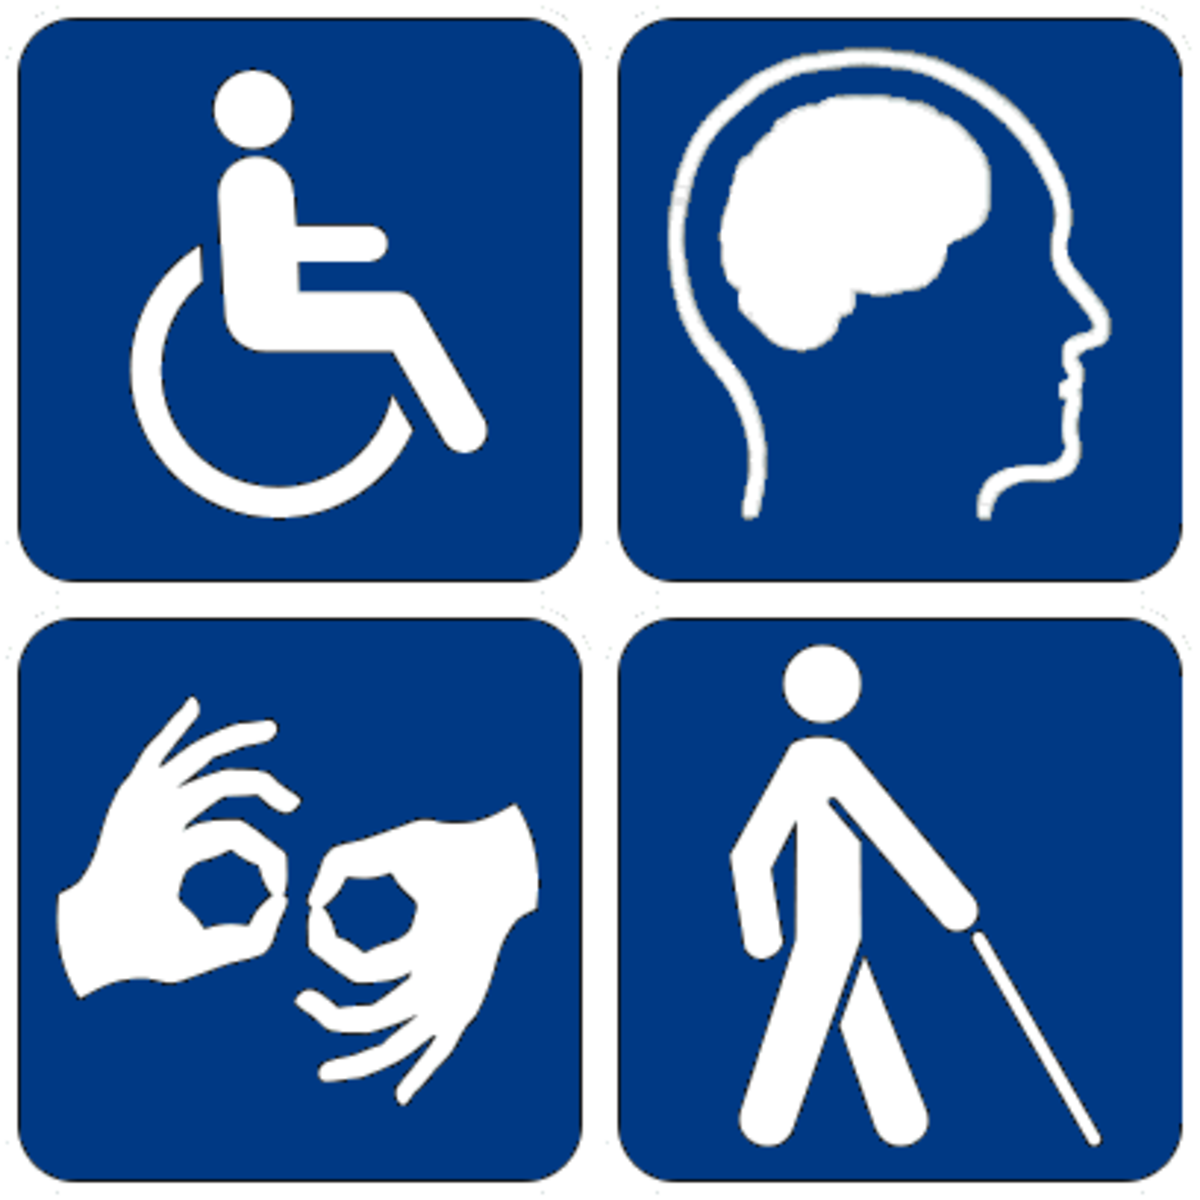 Disability symbol.